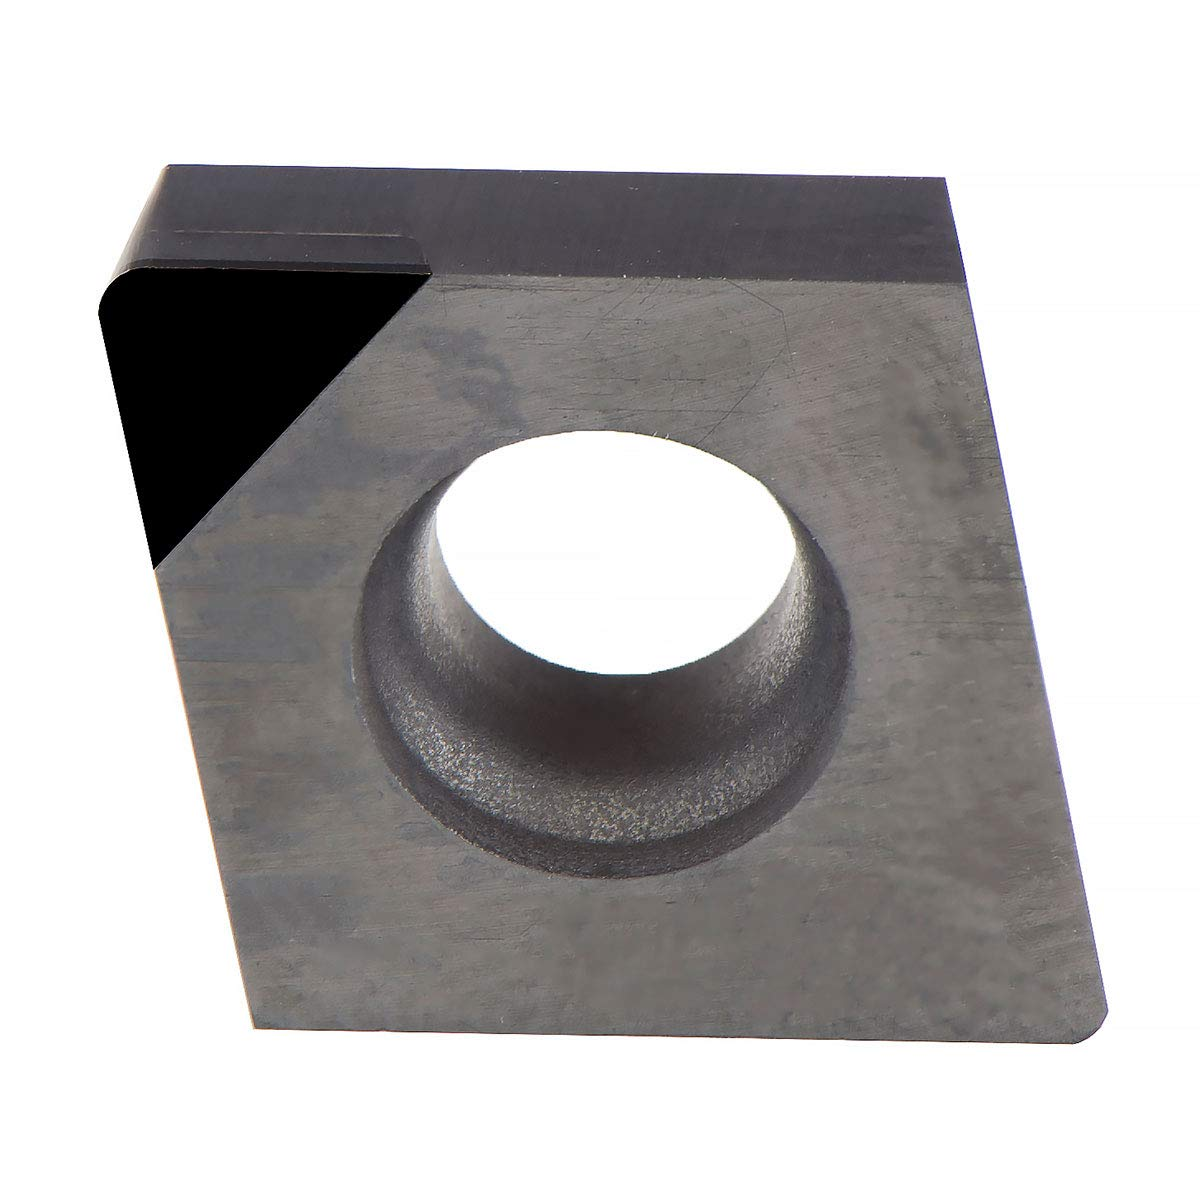 MAXTOOL 2PCs CNMA21.52P2 PCD Tipped Inserts Polycrystalline Diamond Grade 1500 CNMA060208